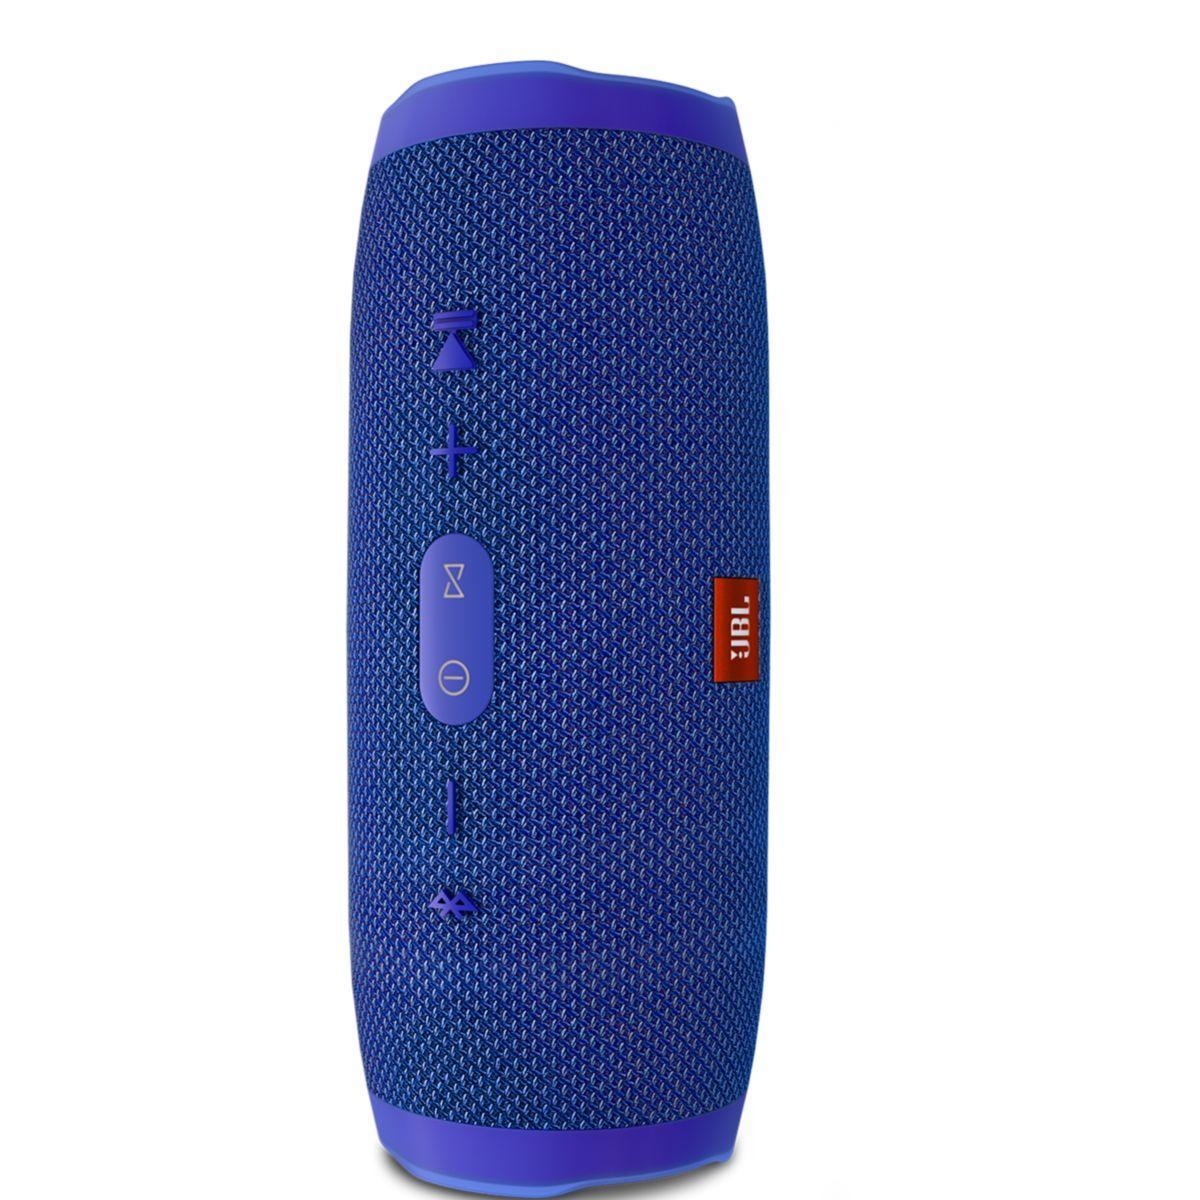 Enceinte bluetooth jbl charge 3 bleu - livraison offerte : code premium (photo)